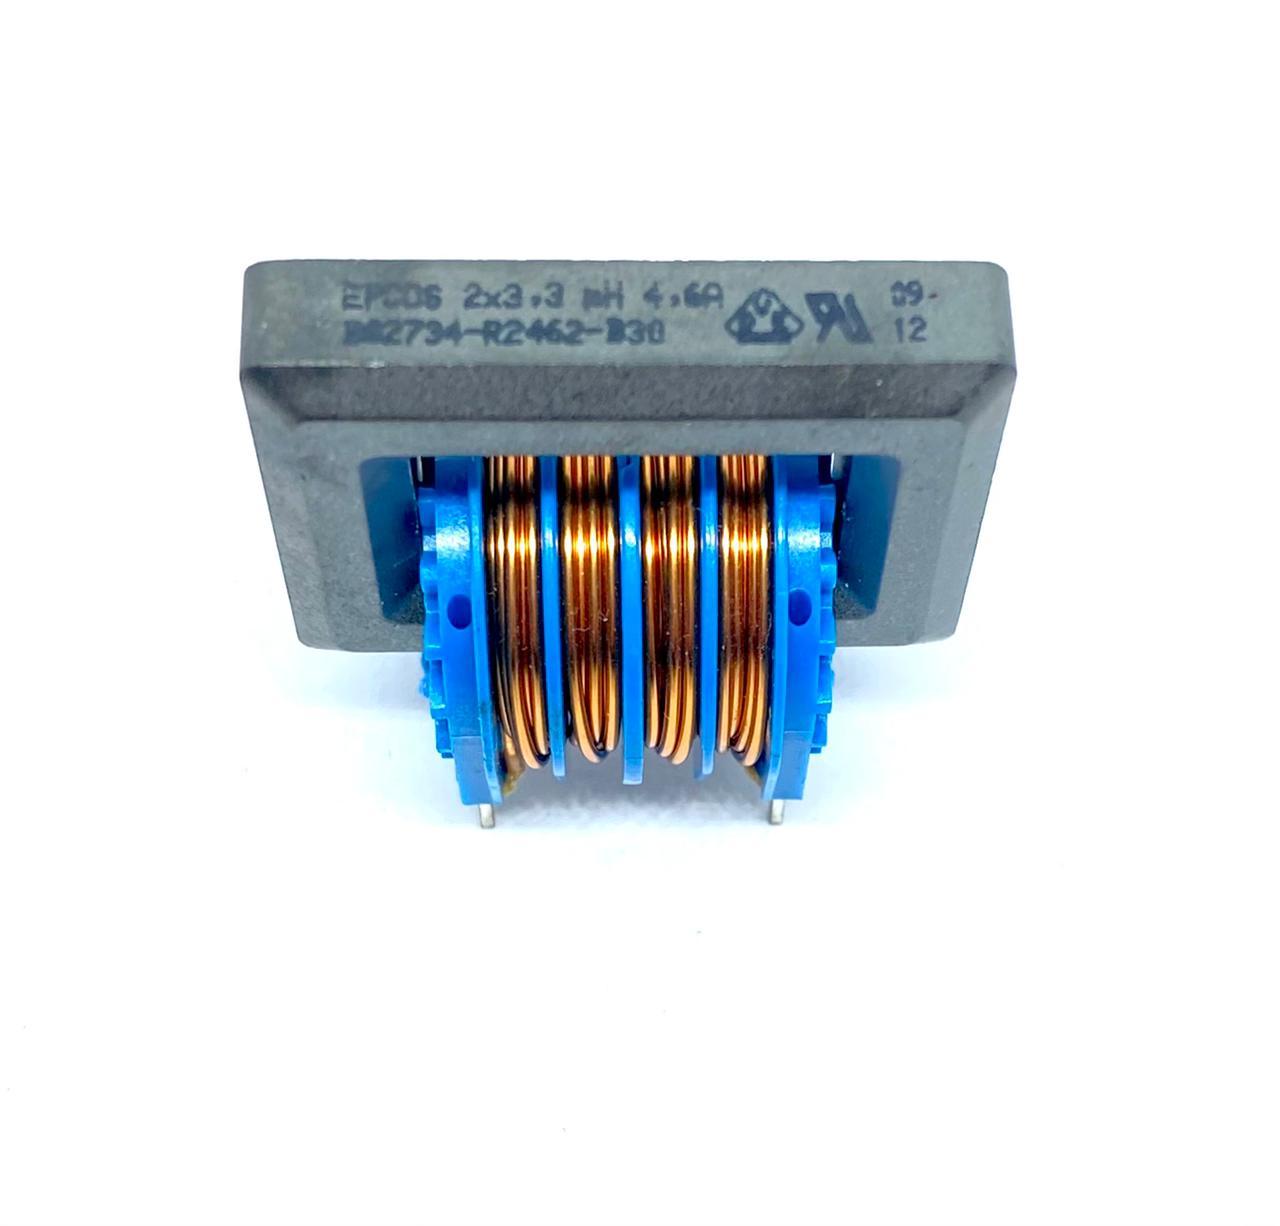 INDUTOR MONO B82734-R2462-B30 0,6KV 250V EPCOS